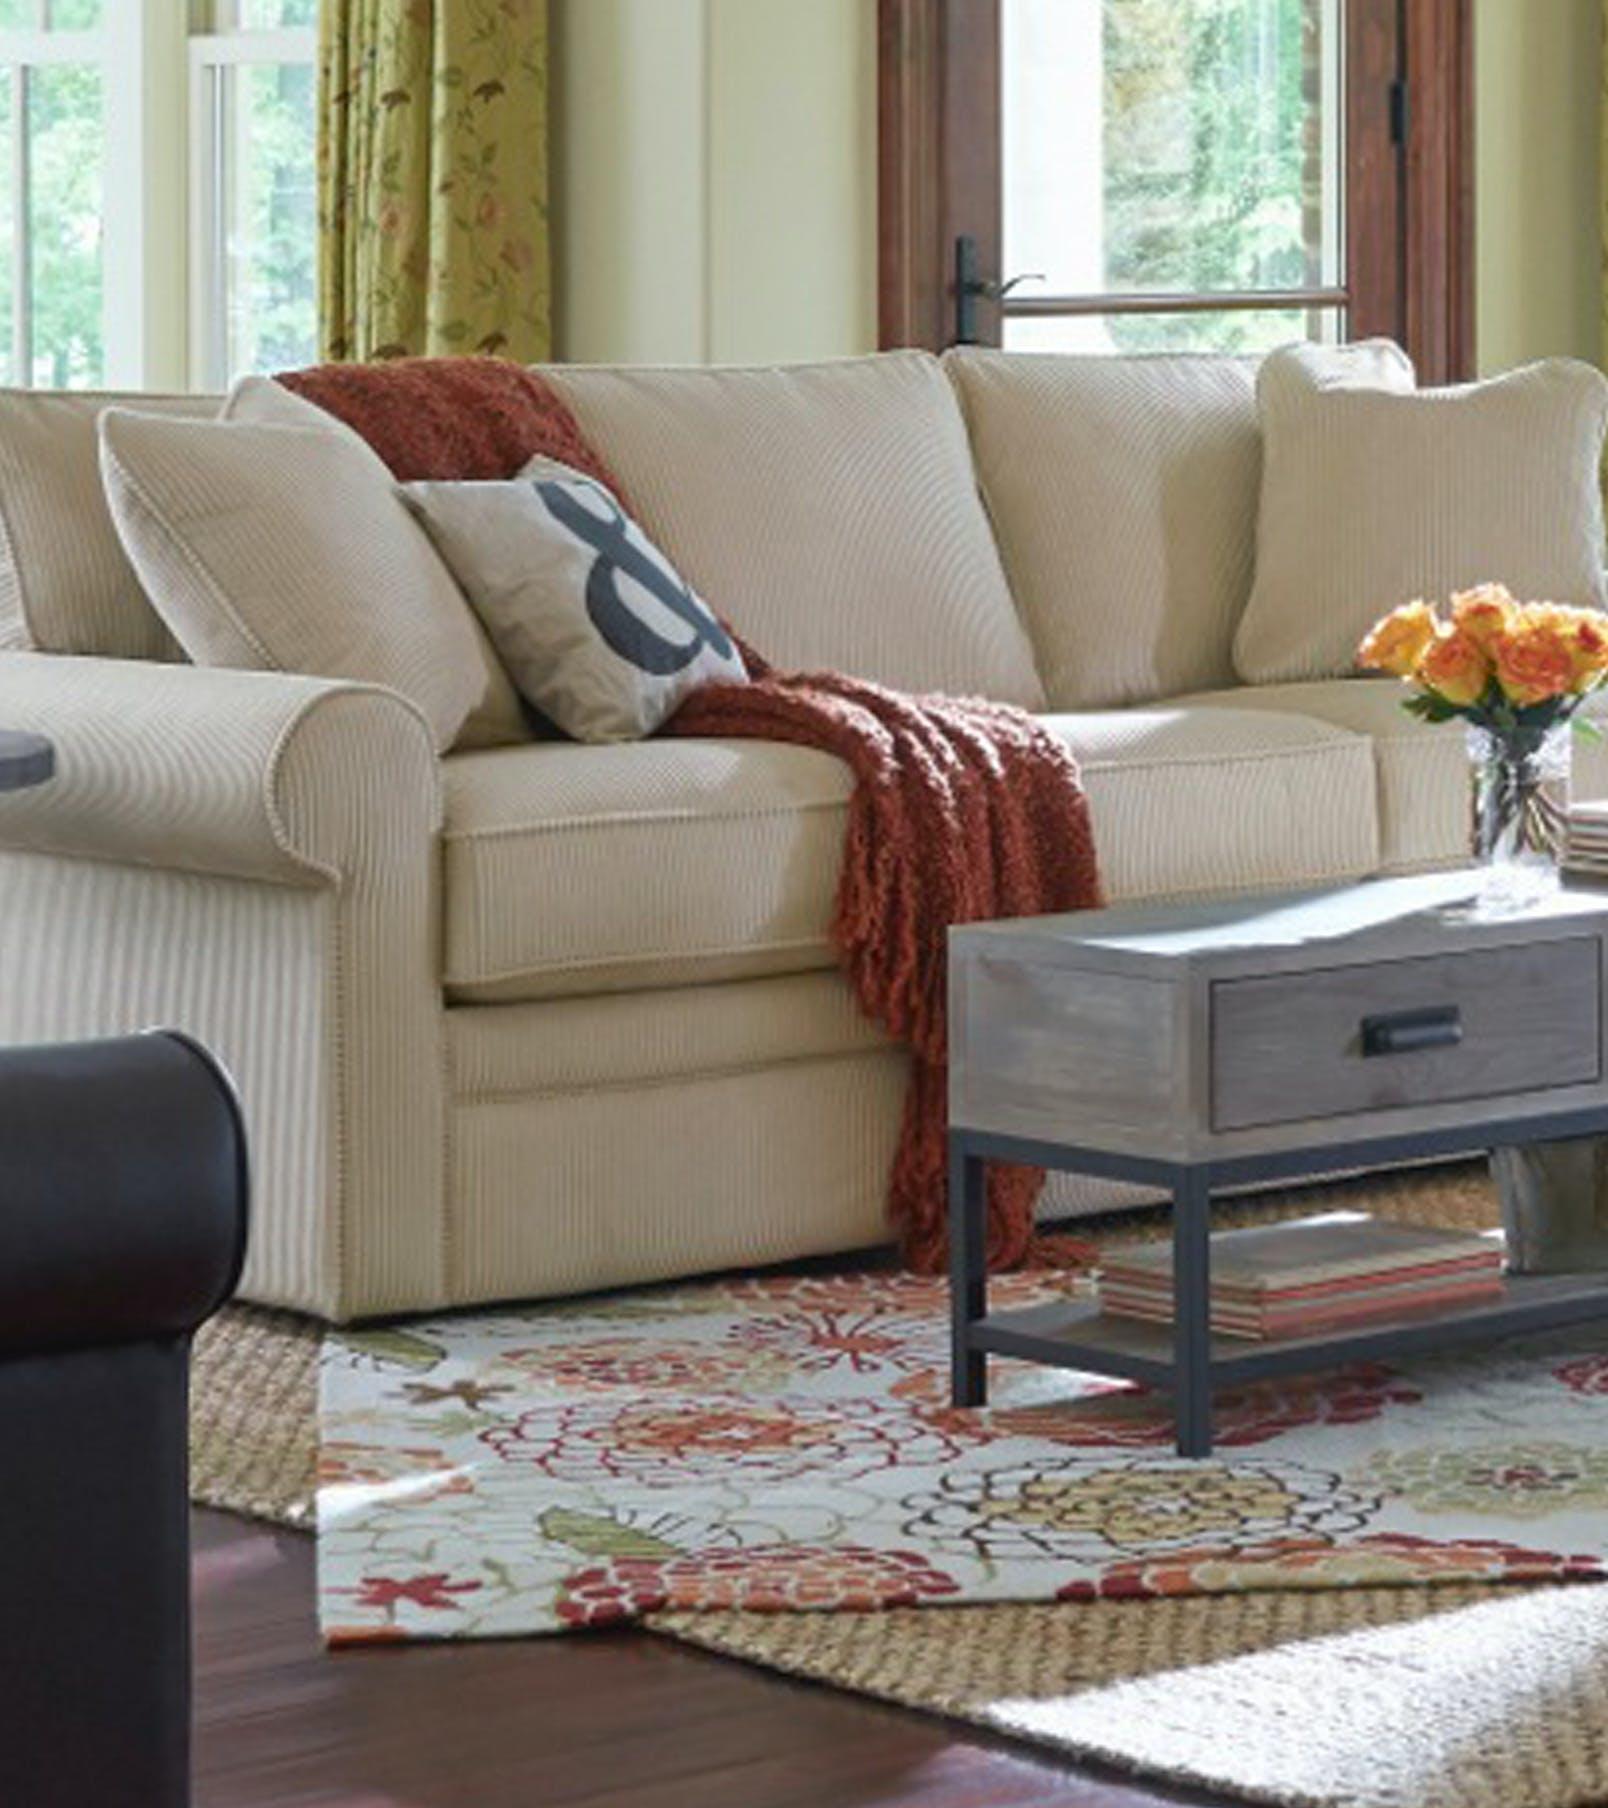 Groovy Furniture Store And Mattress Retailer In Saginaw Mi Art Short Links Chair Design For Home Short Linksinfo